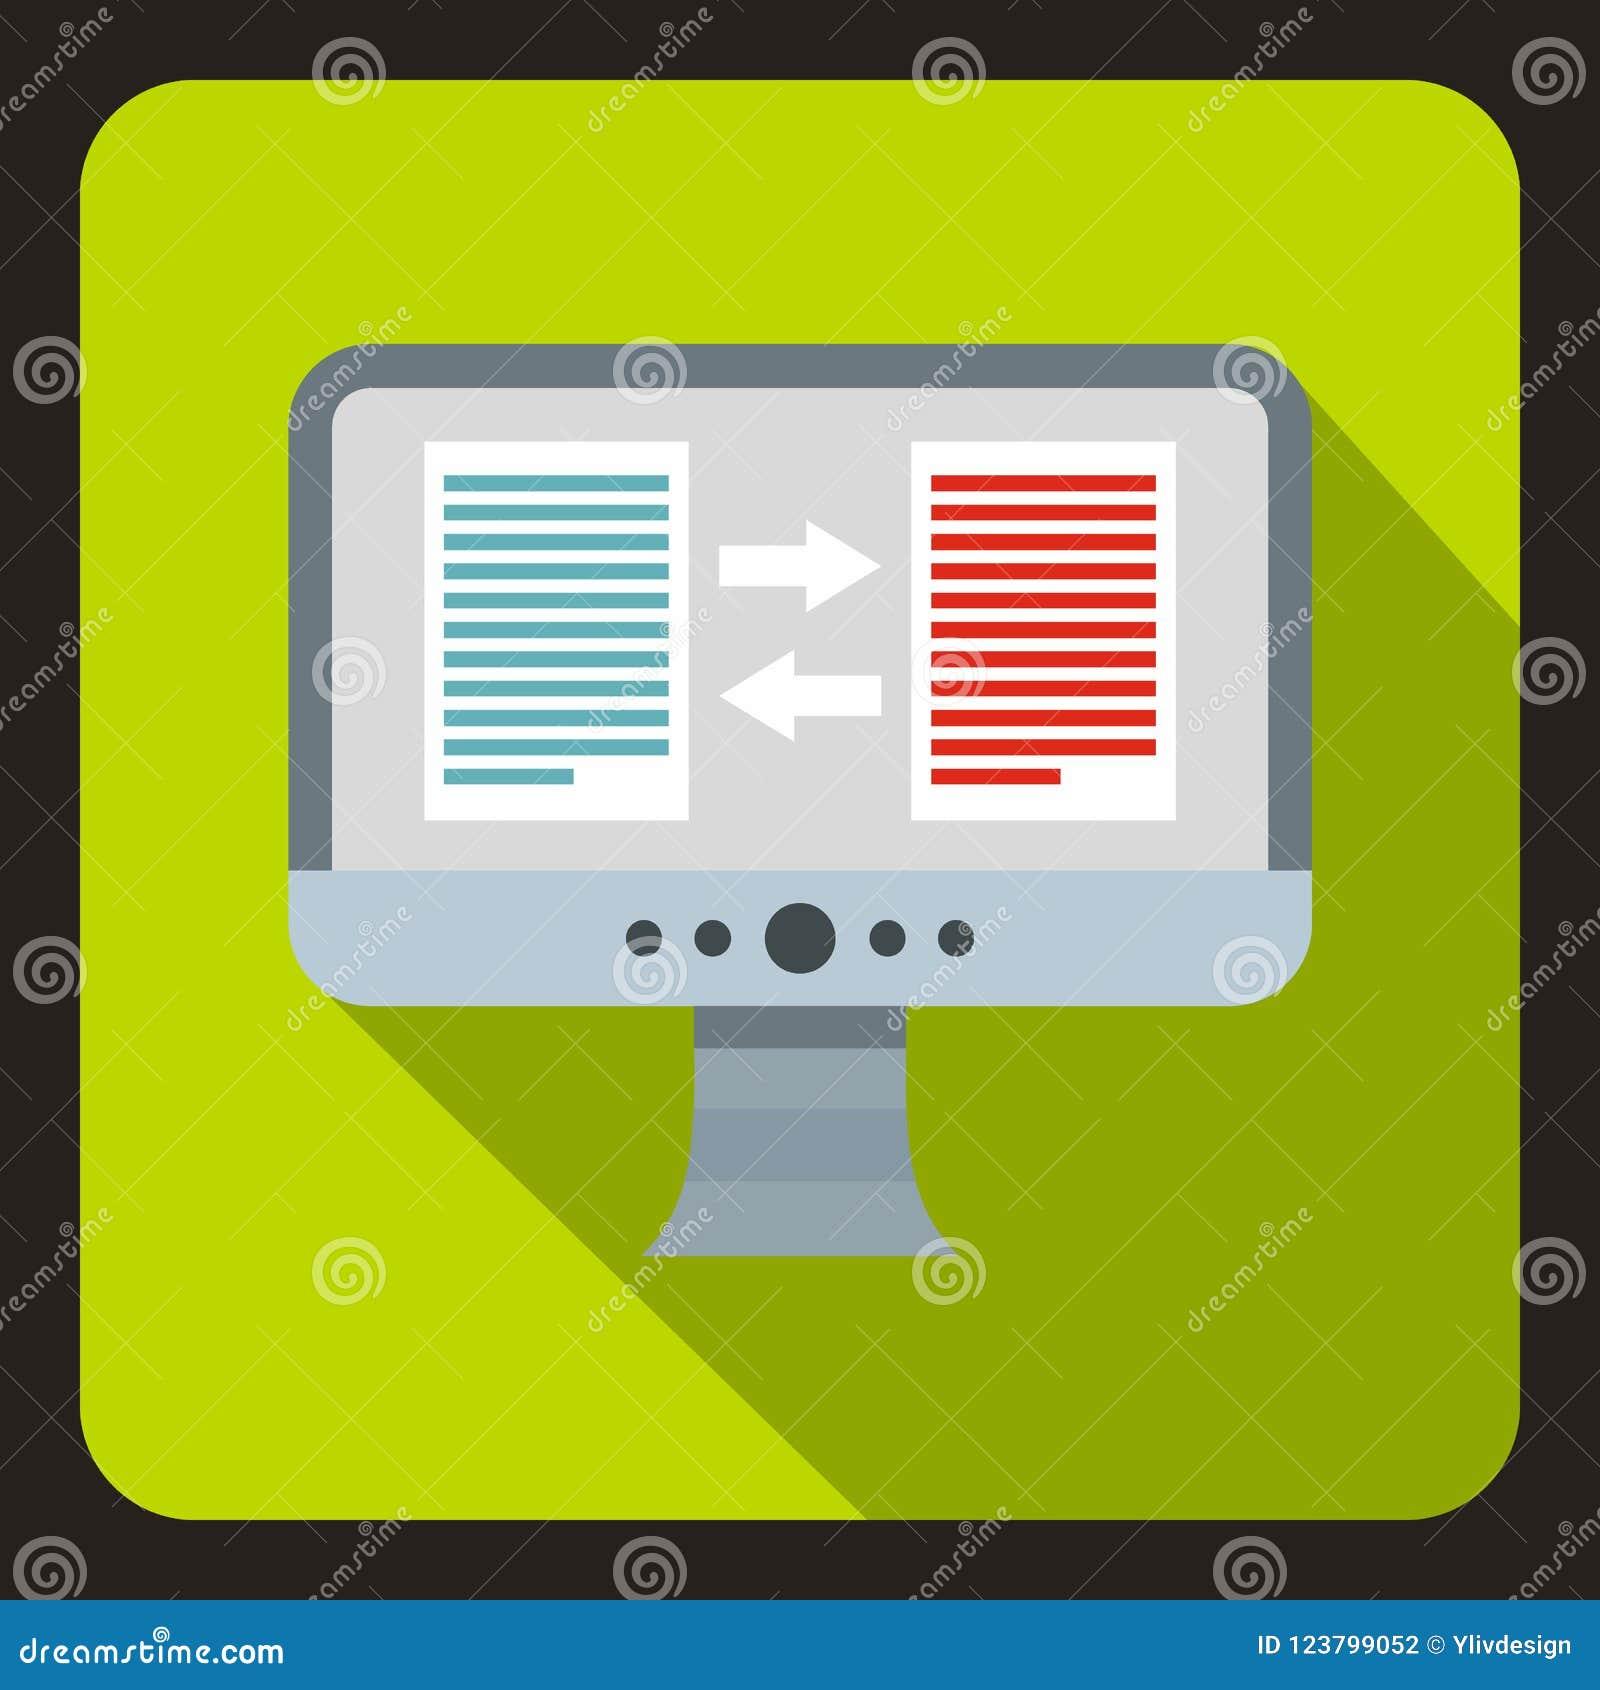 translation of text on computer icon flat style stock illustration